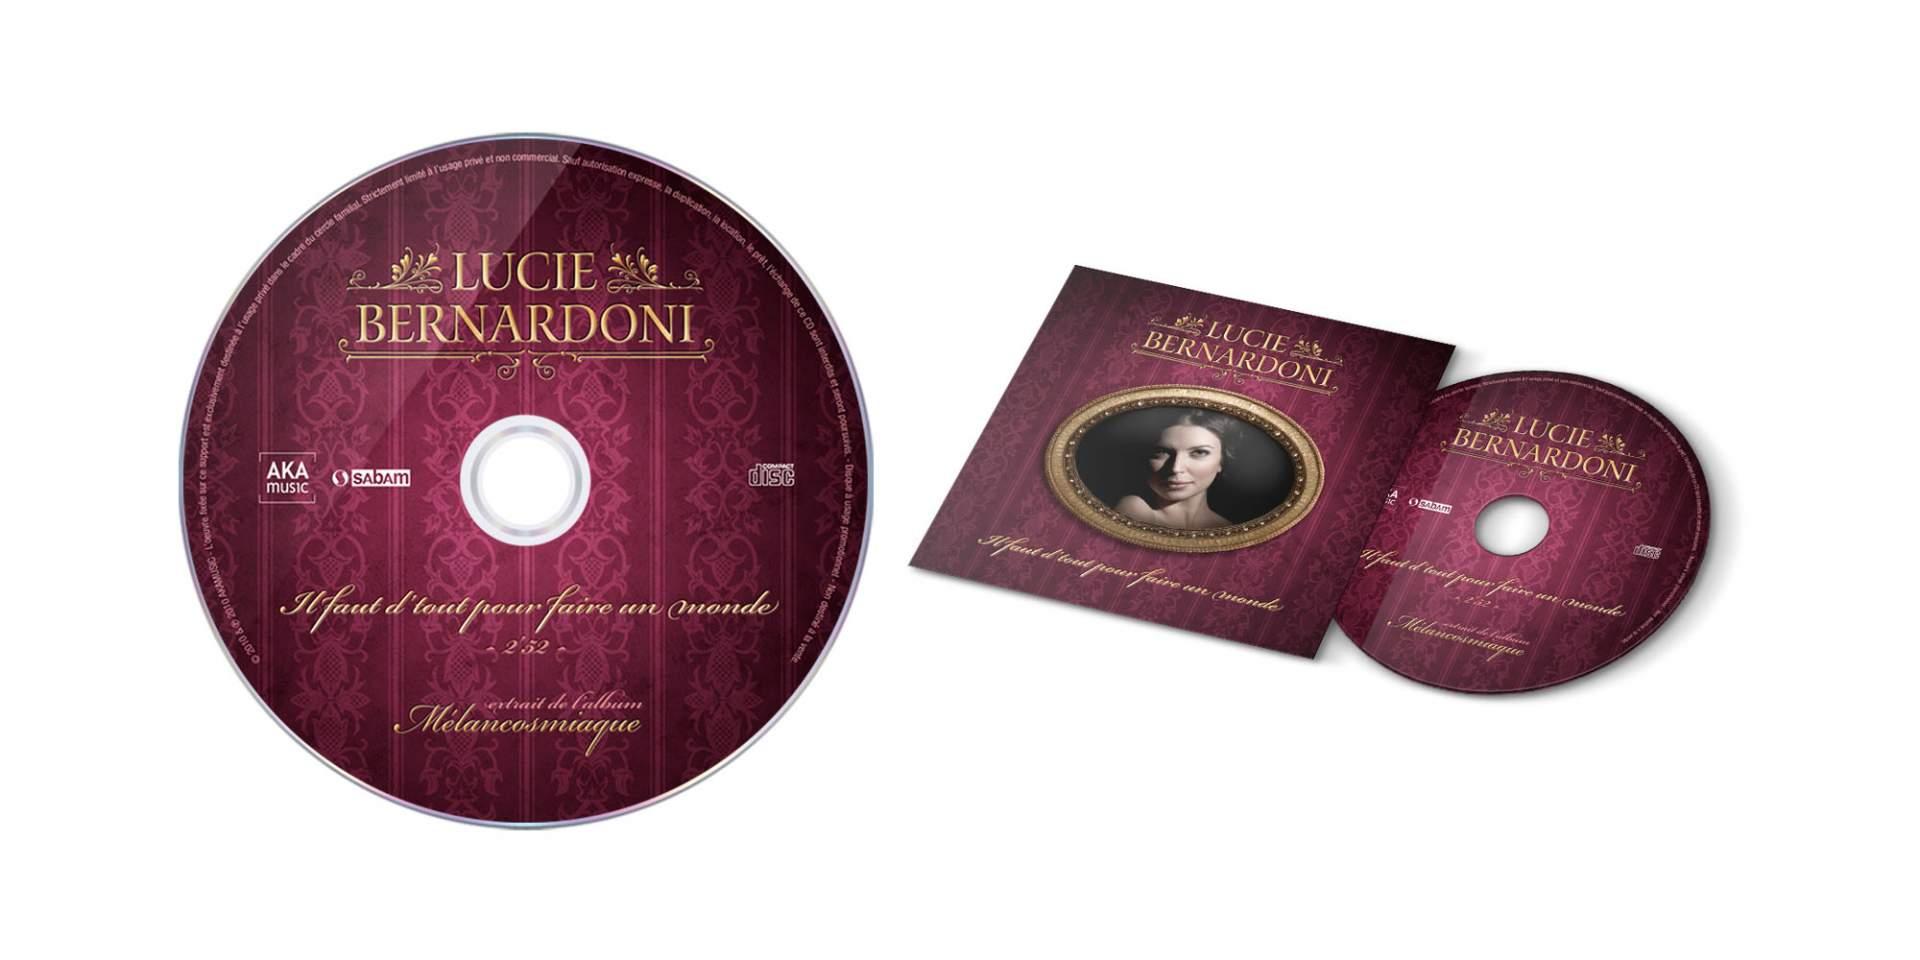 08-DA2 AGENCY-Lucie Bernardoni 03